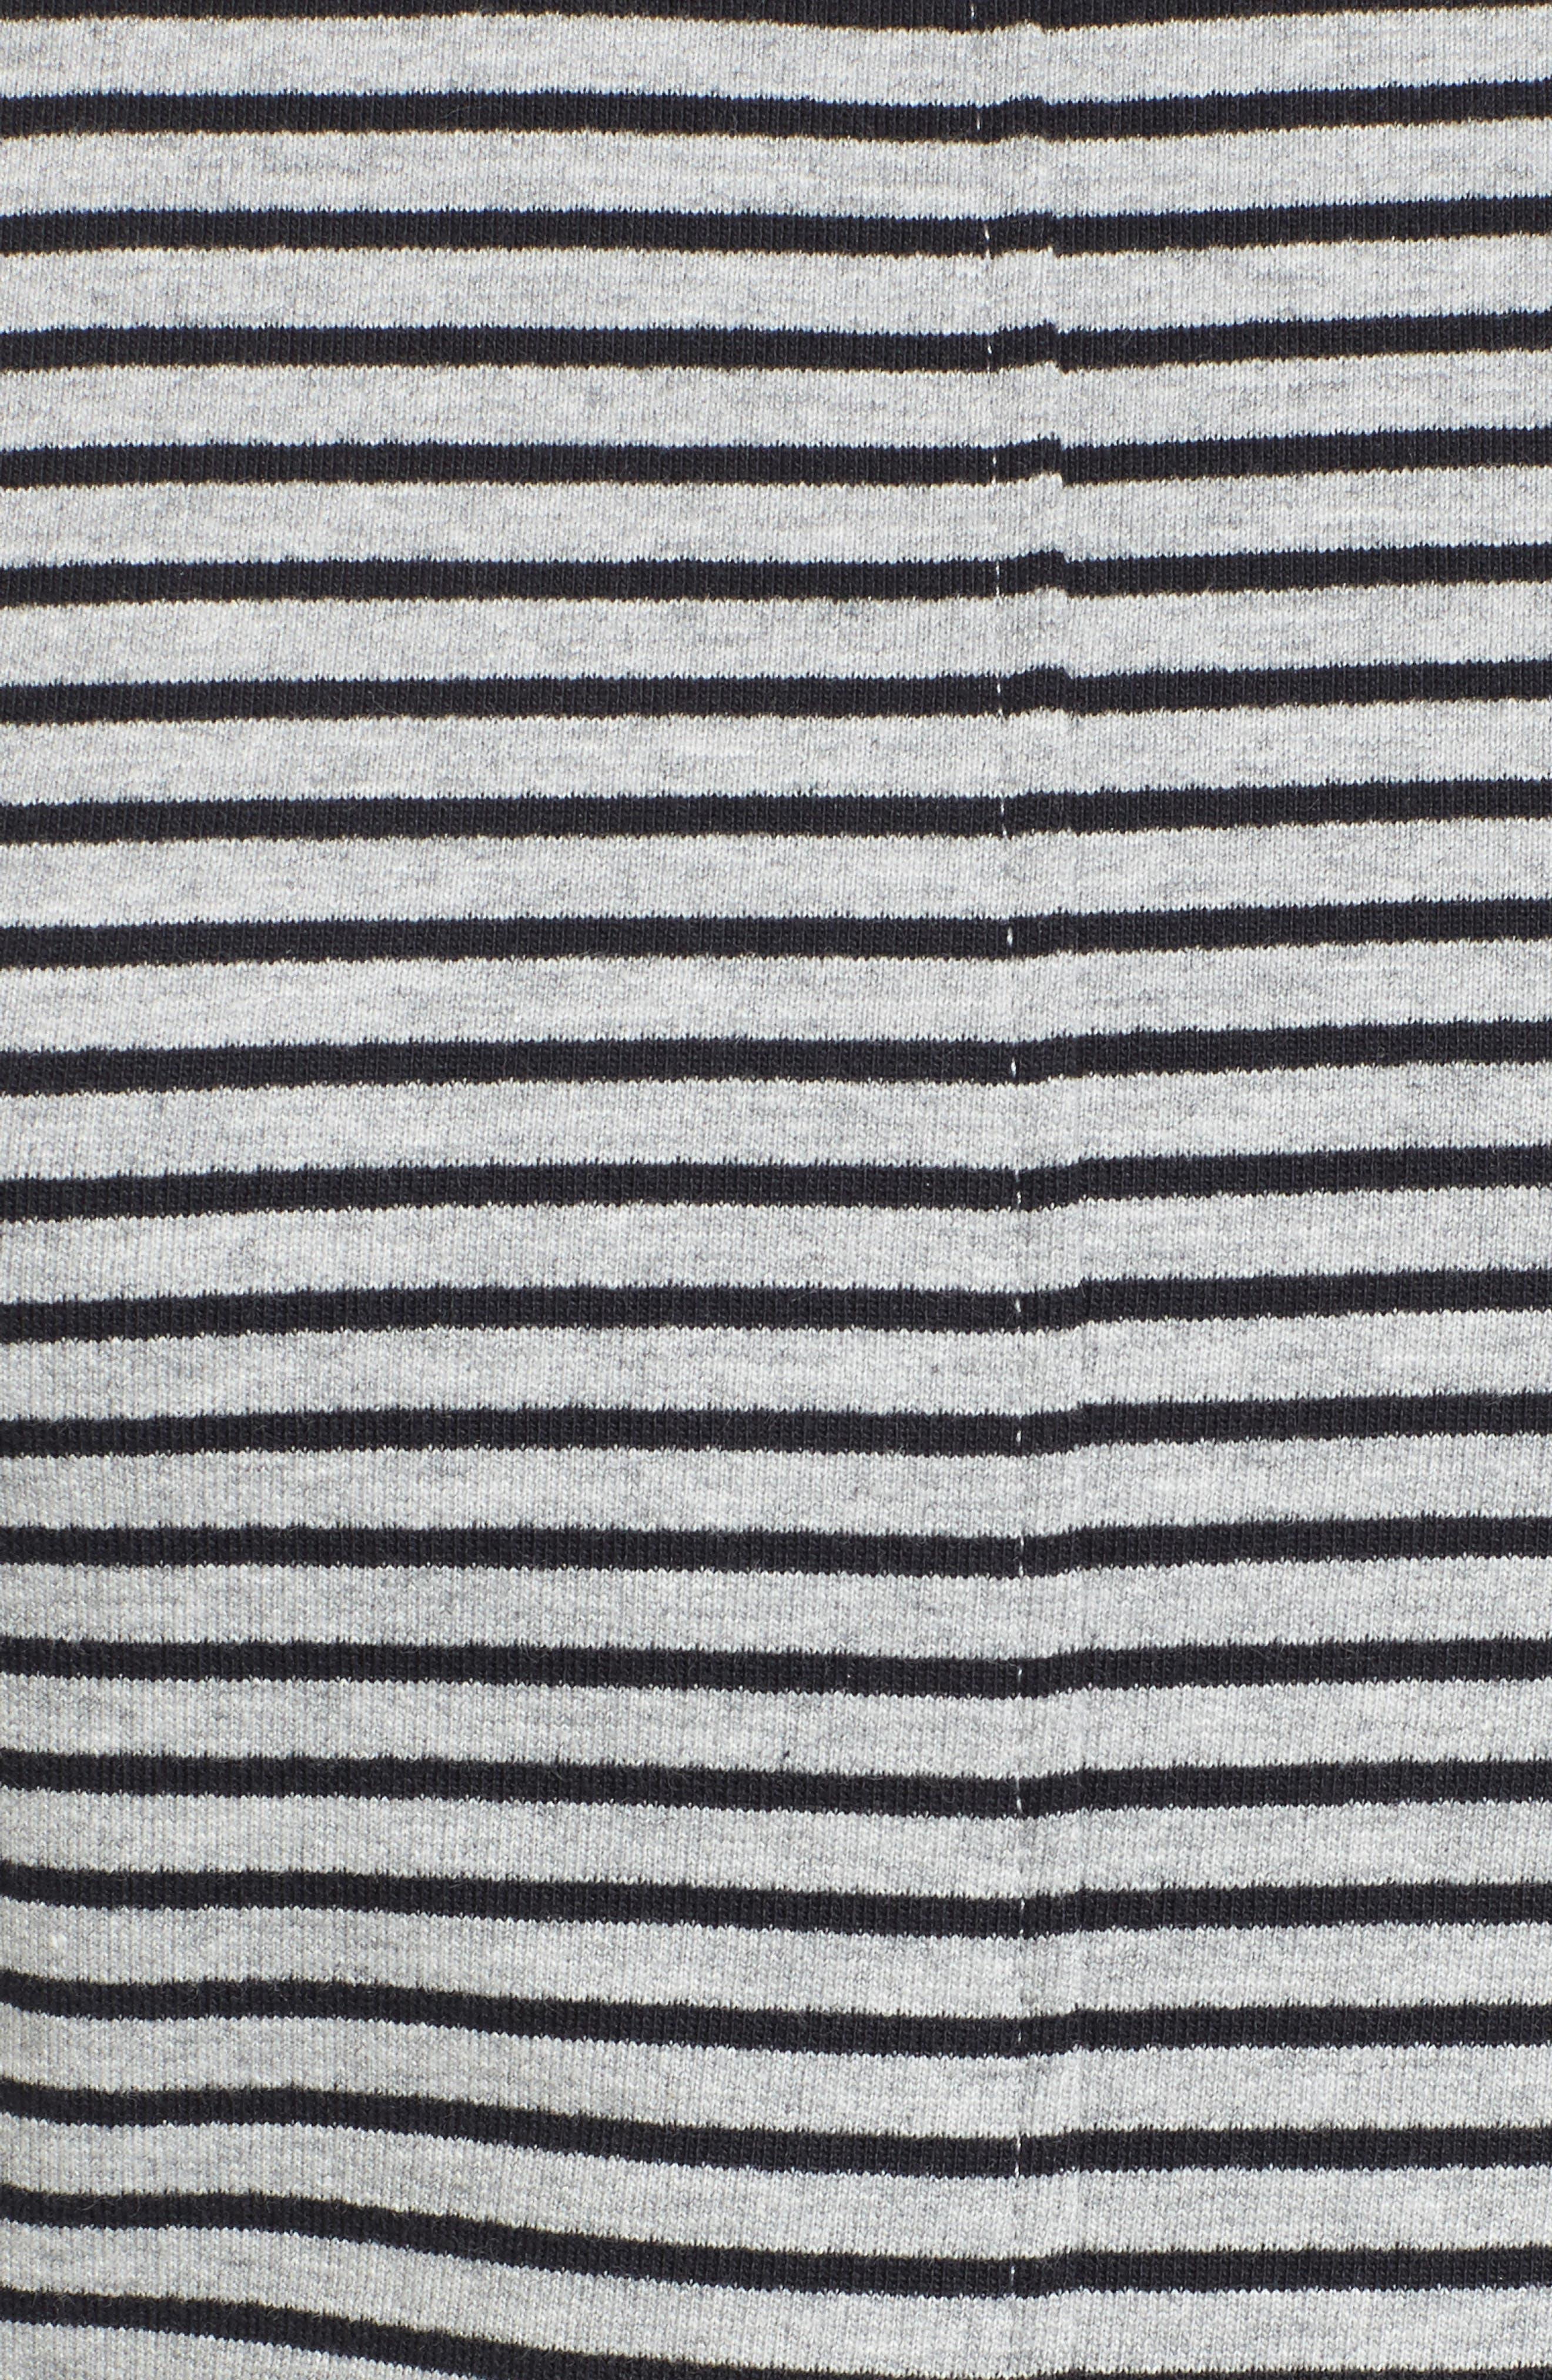 Pleated Sweatshirt,                             Alternate thumbnail 5, color,                             Grey Heather- Navy Seam Stripe